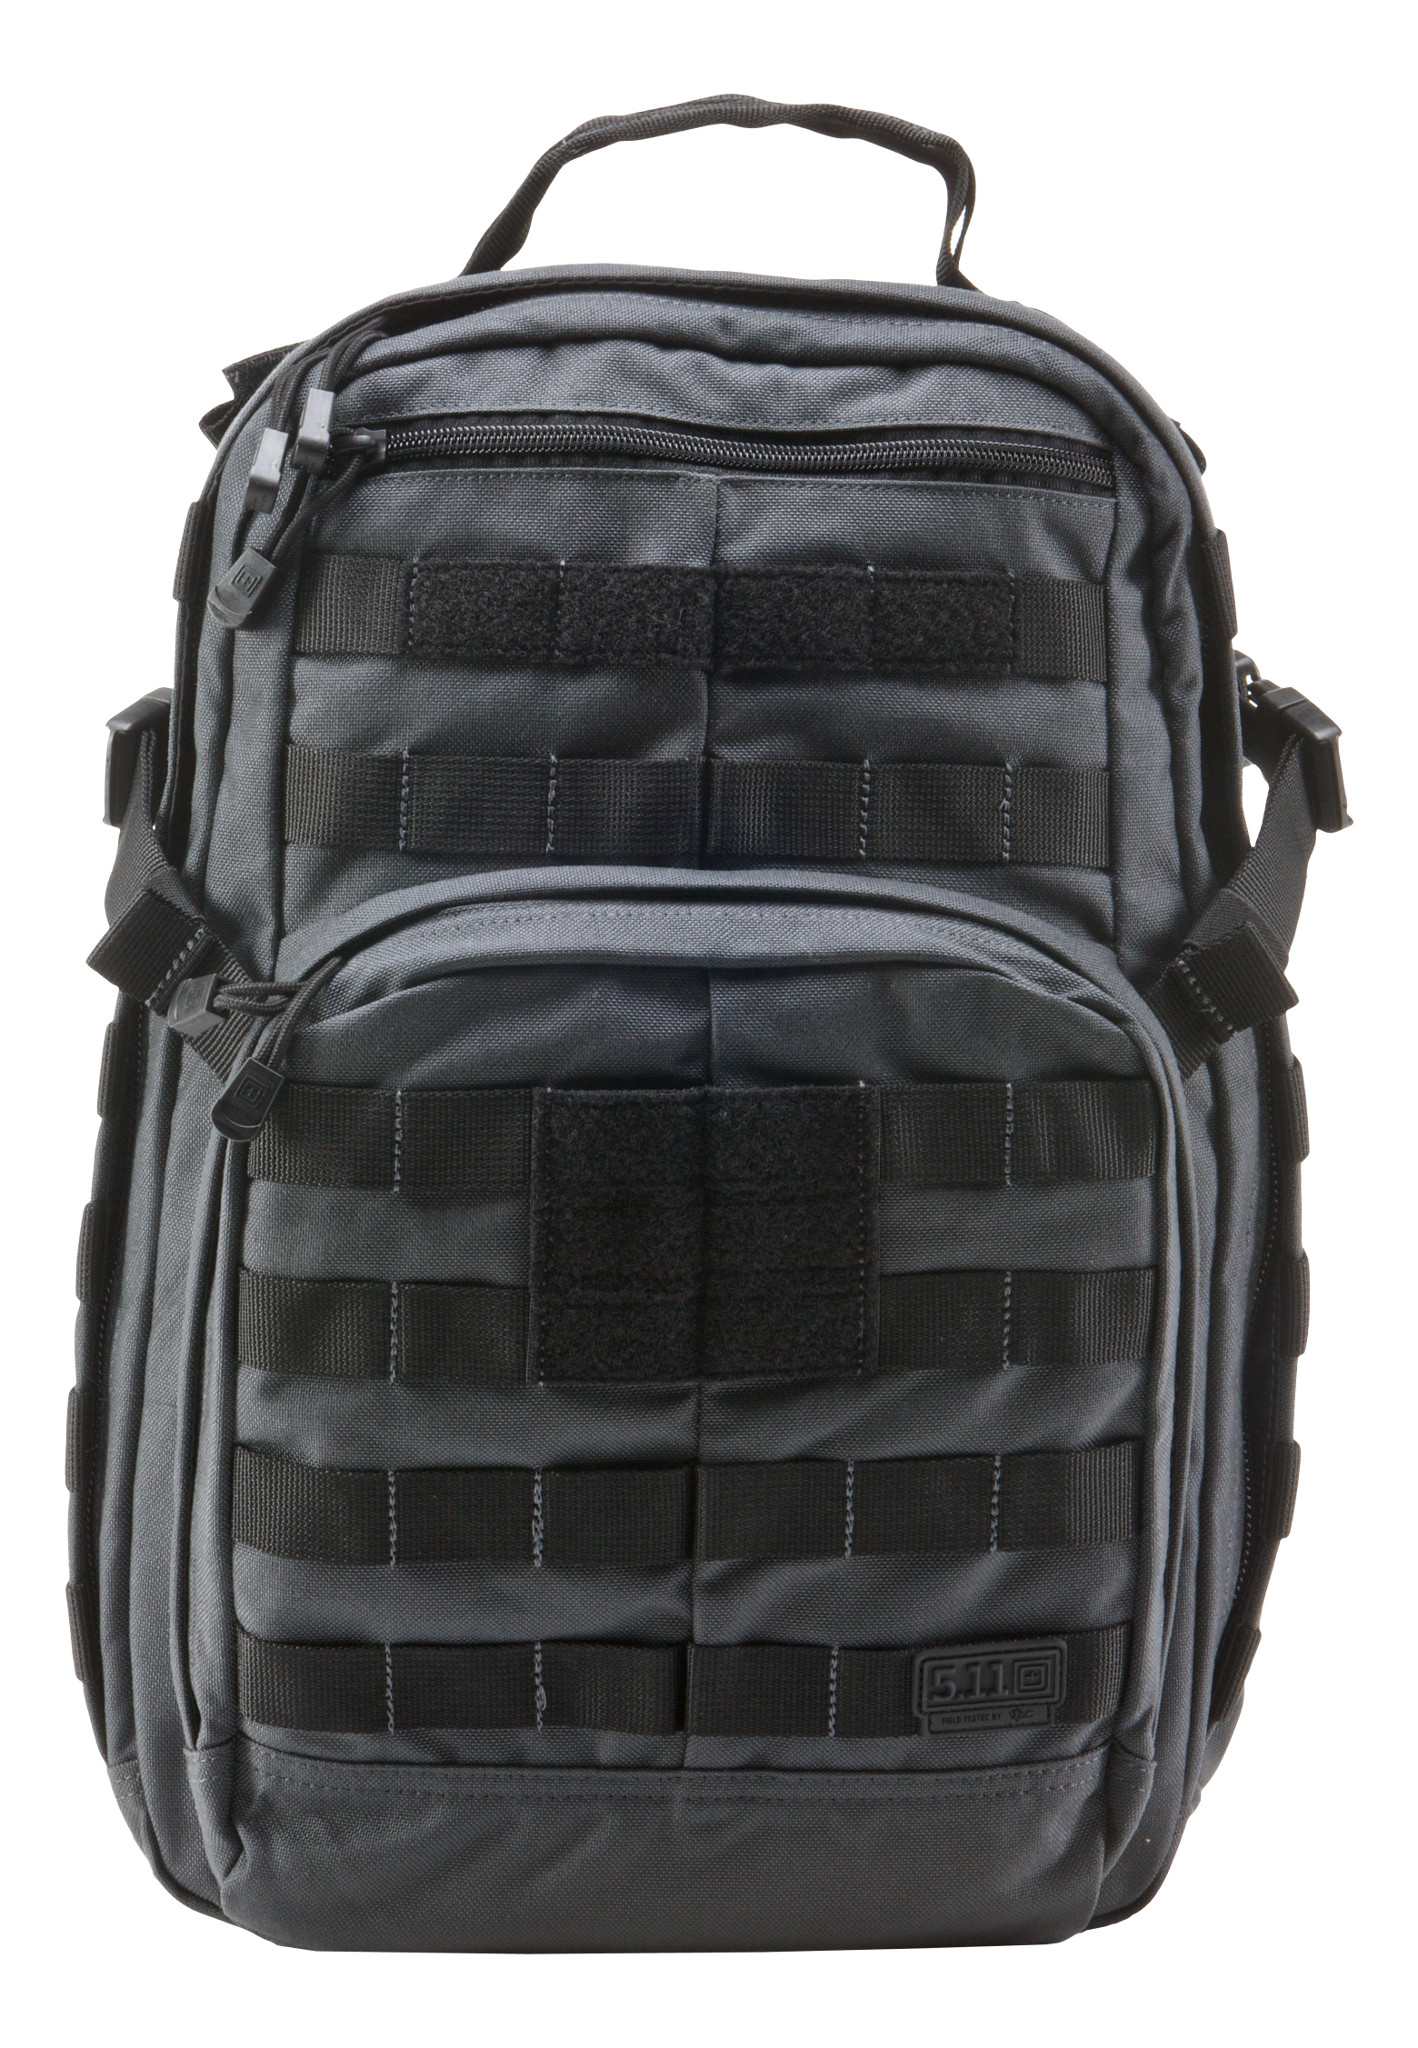 2dc0b6e60b1ae Plecak 5.11 Tactical RUSH12 - Double Tap (56892-026) - e-militaria.pl